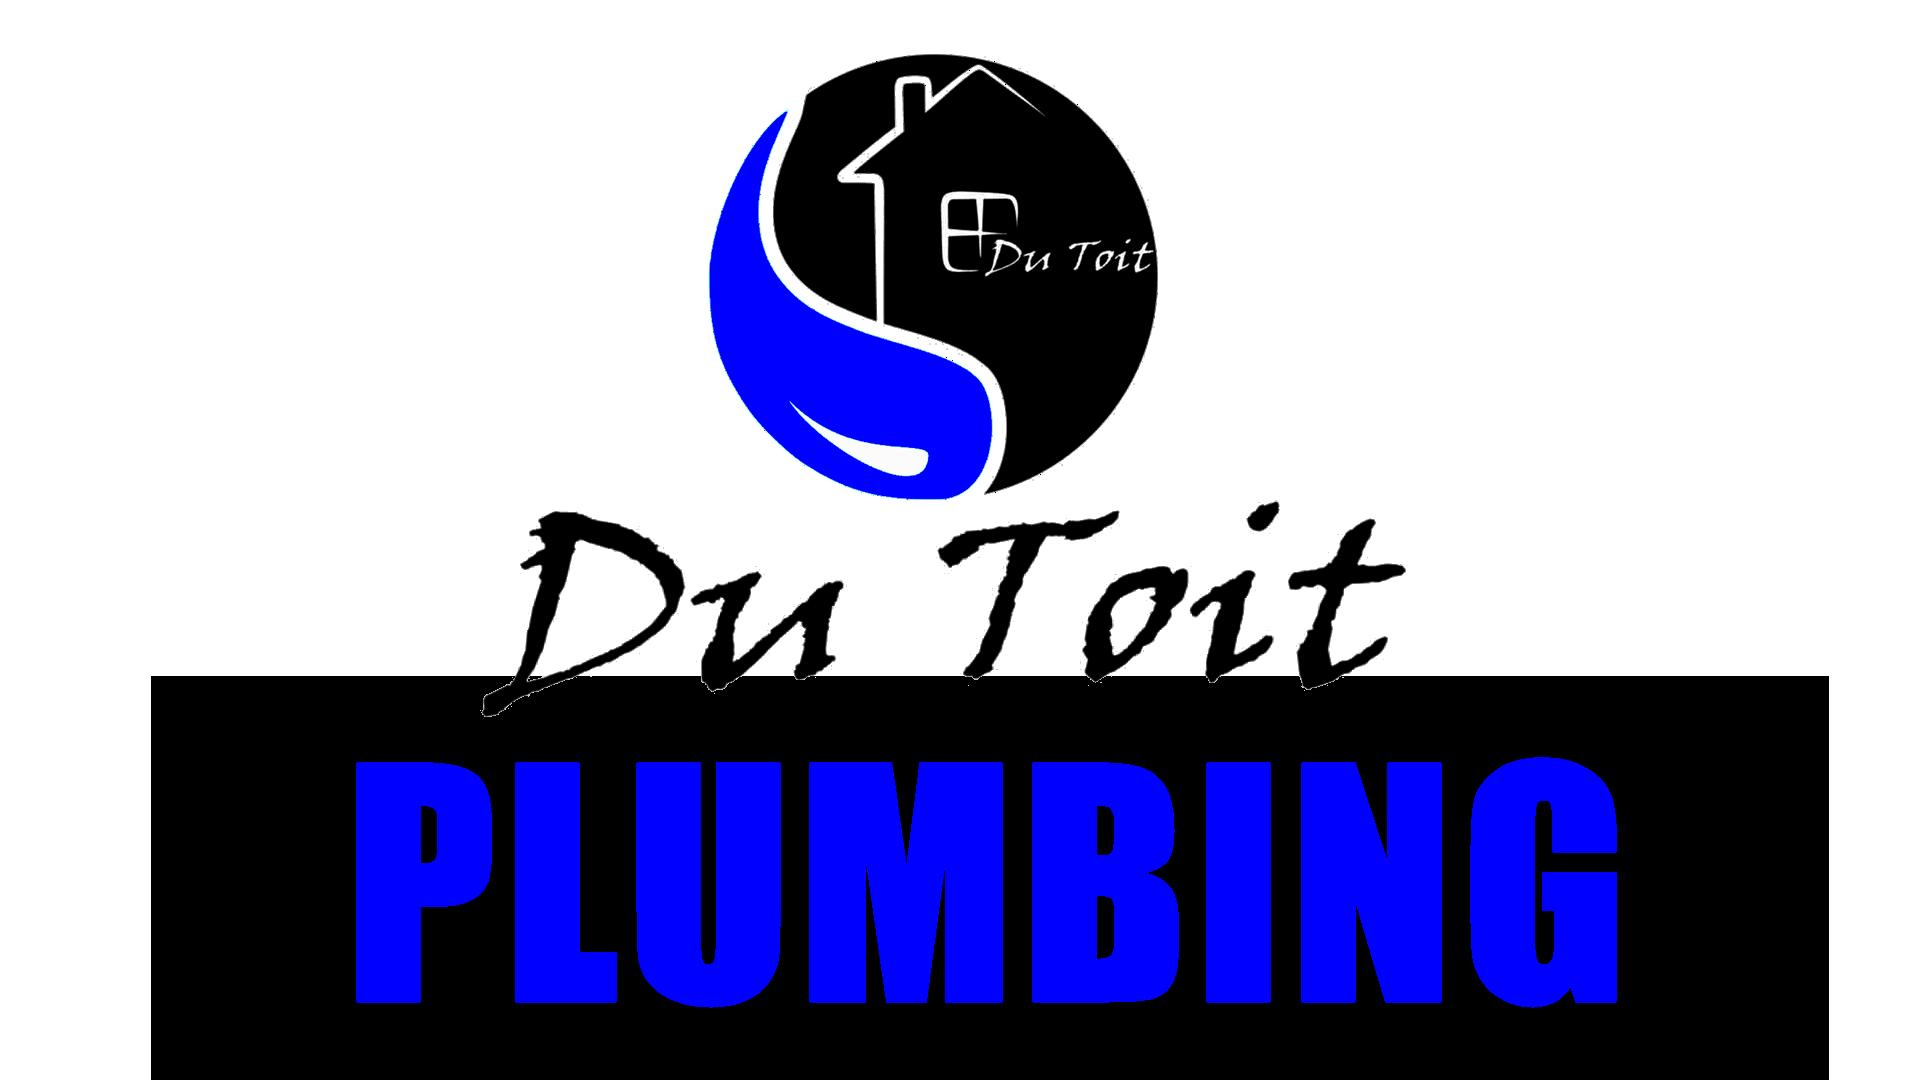 Du Toit Plumbing Services - Professional Plumber in George & Mossel Bay. Leak Repairs, Drain Repairs, Geyser Repairs & Installations